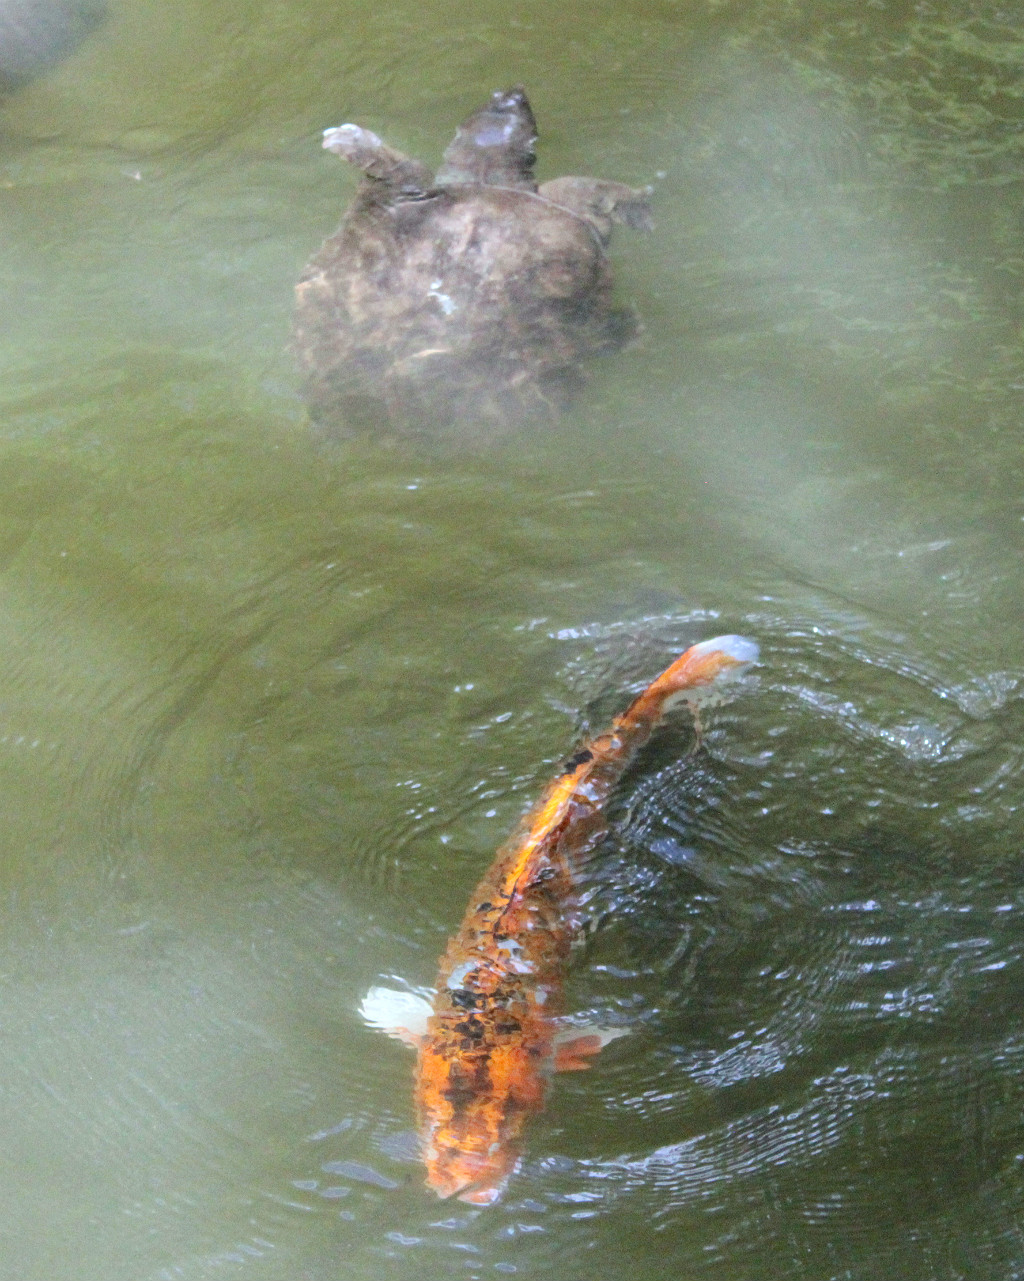 Turtle and koi in the shirne pond at Oyama Shrine in Kanazawa, Japan